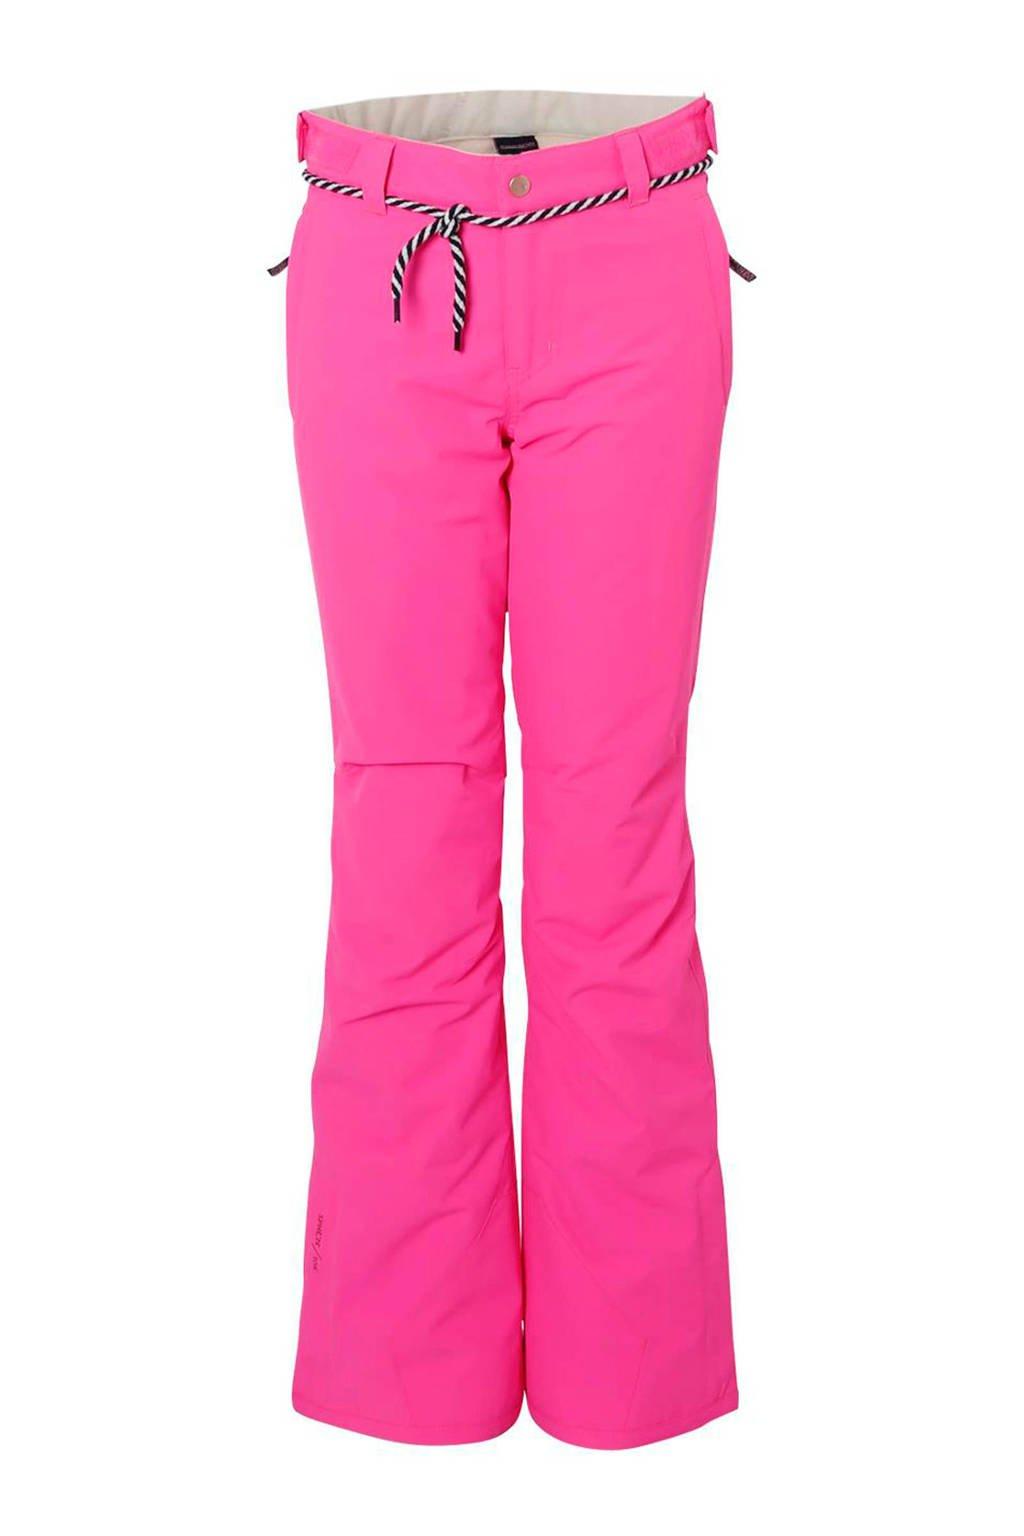 Brunotti skibroek Sunleaf neon roze, Neon roze